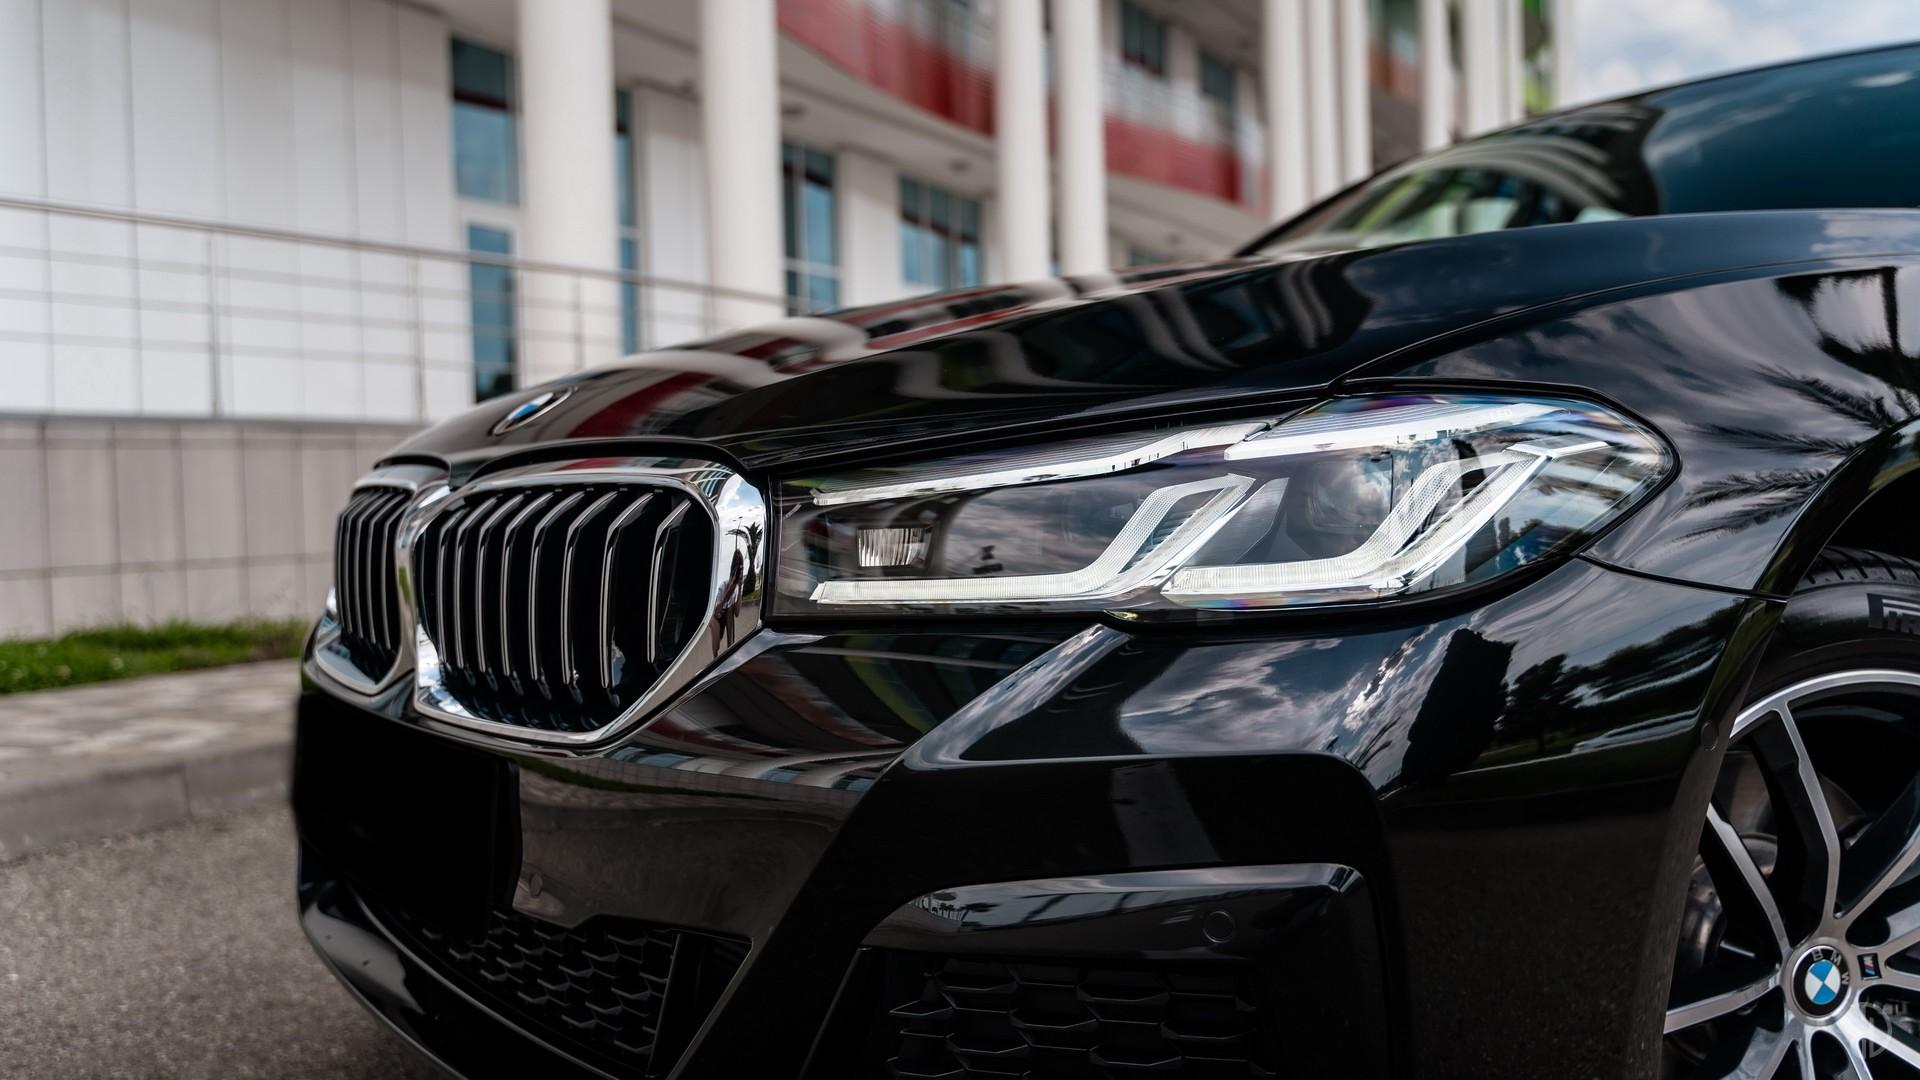 Аренда BMW 520d G30 в Сочи. Фото 7